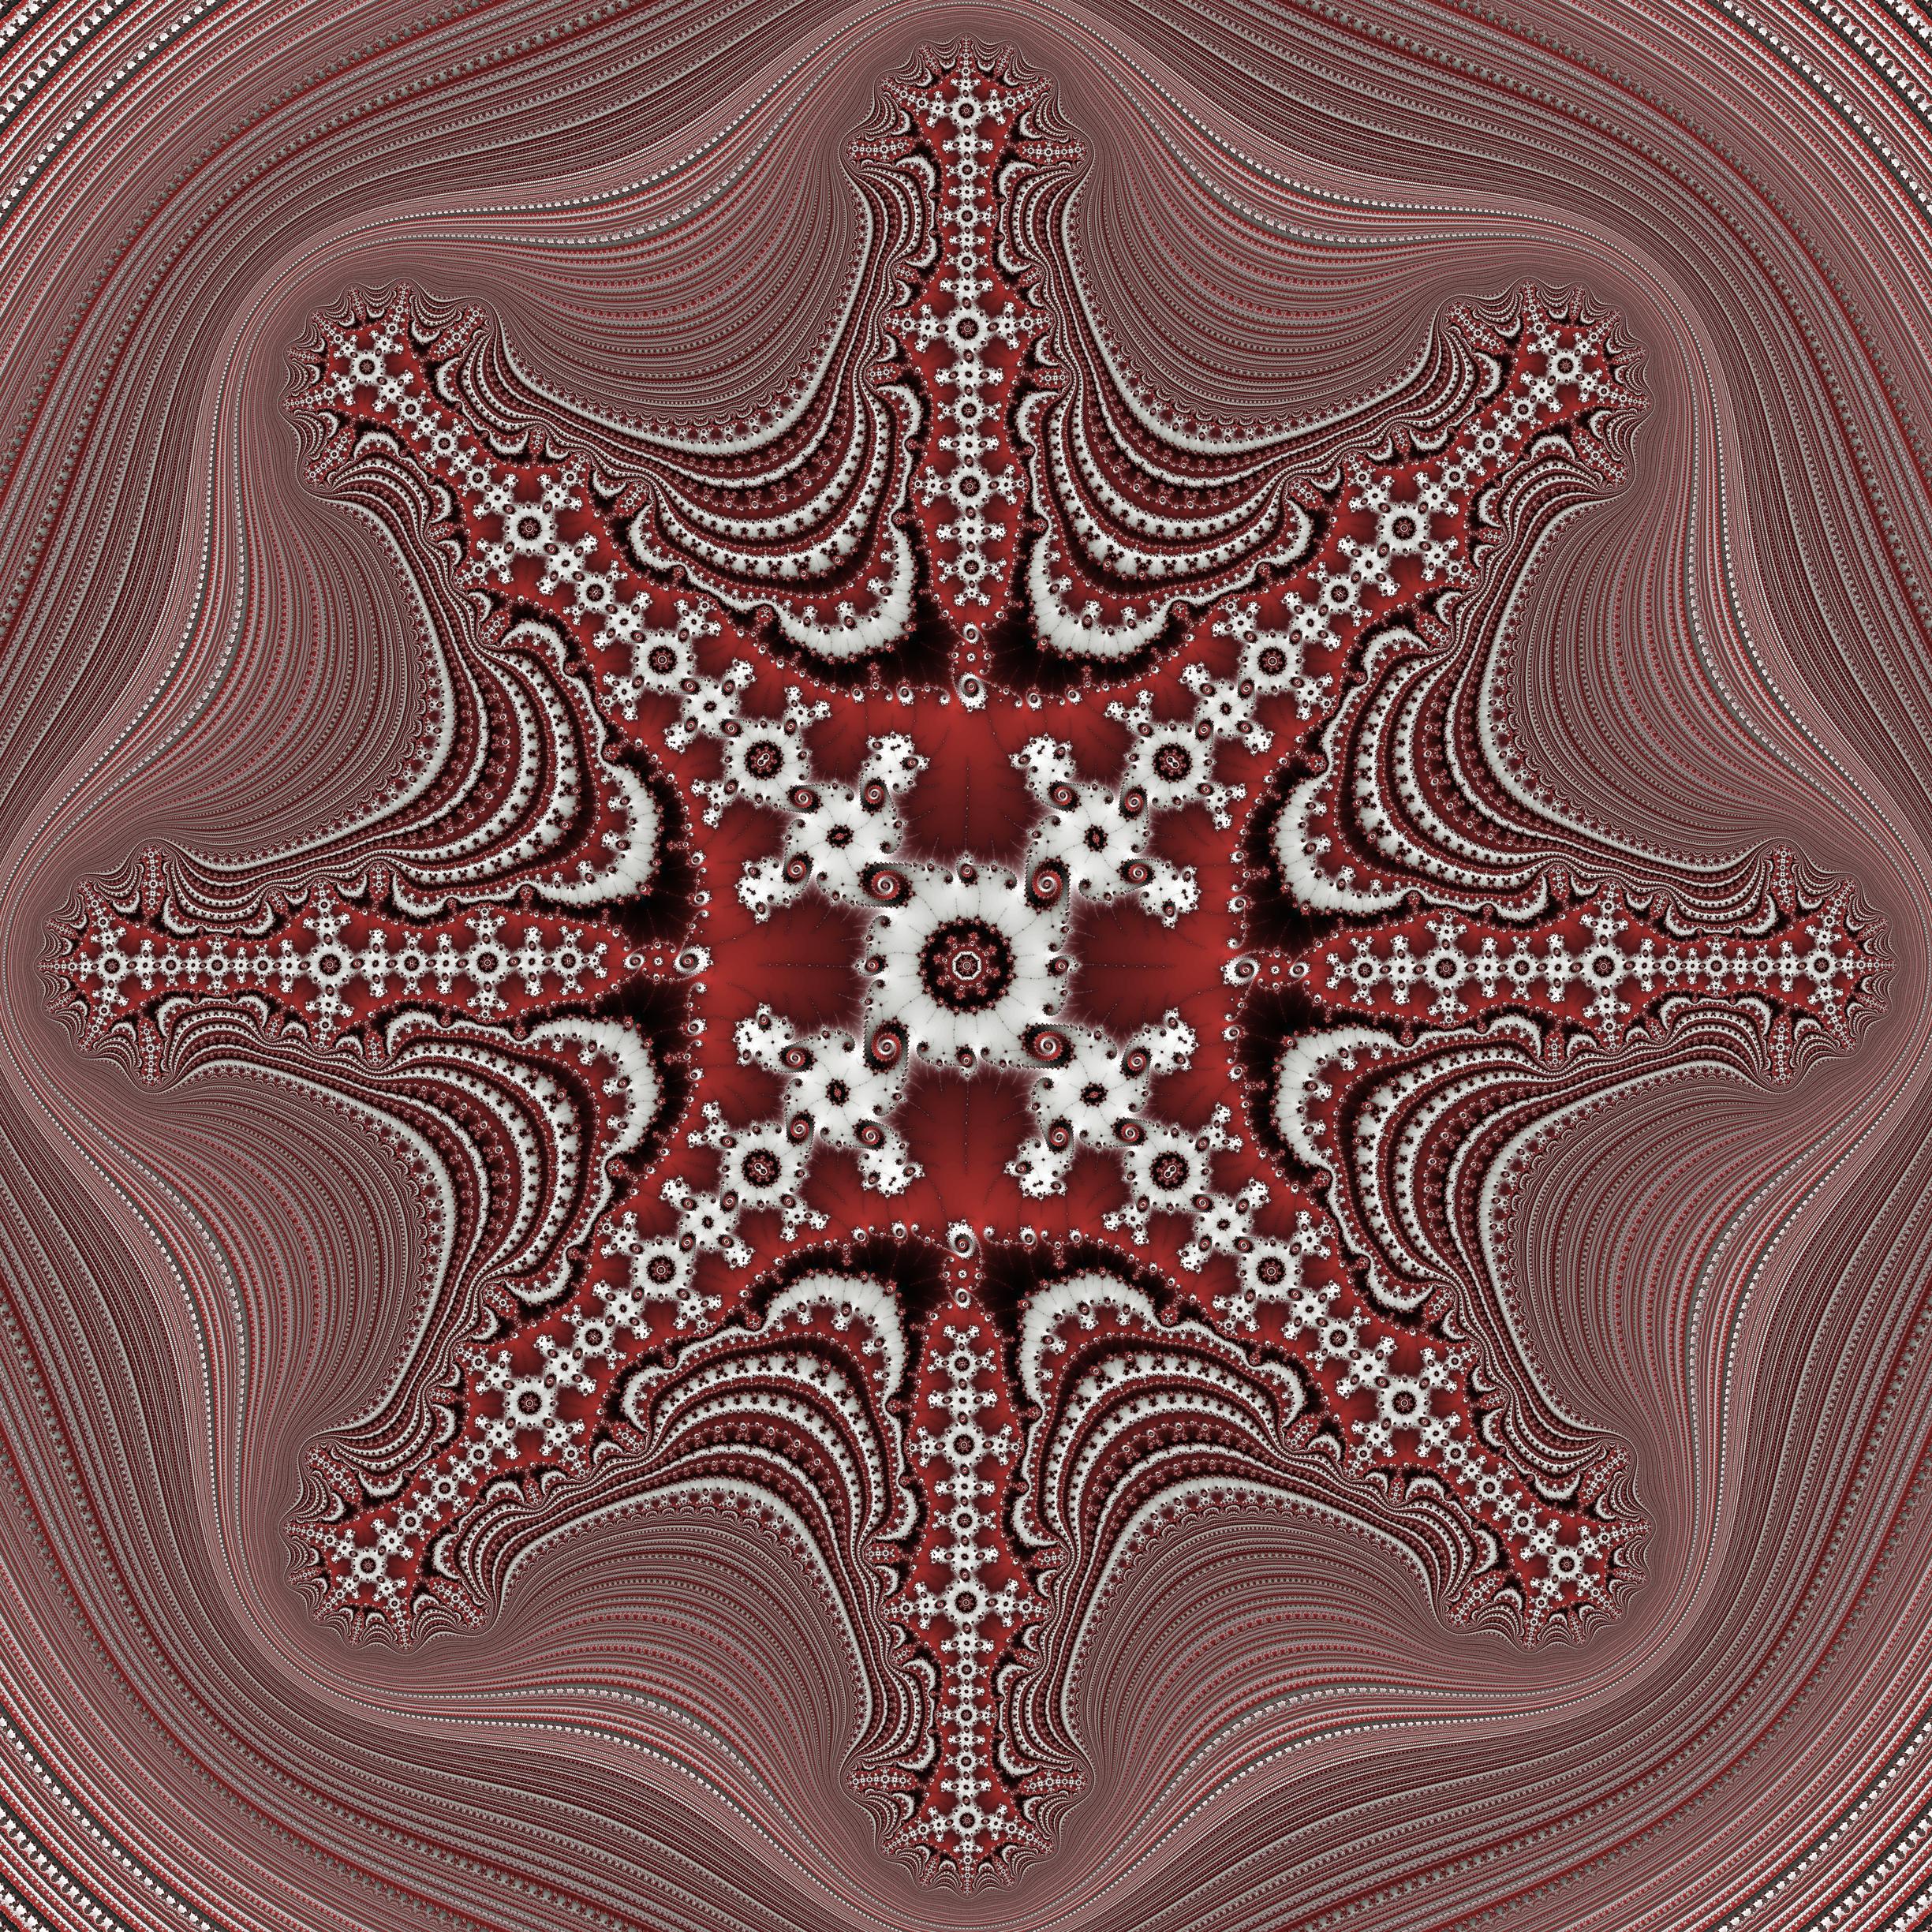 Cross Complex by DinkydauSet